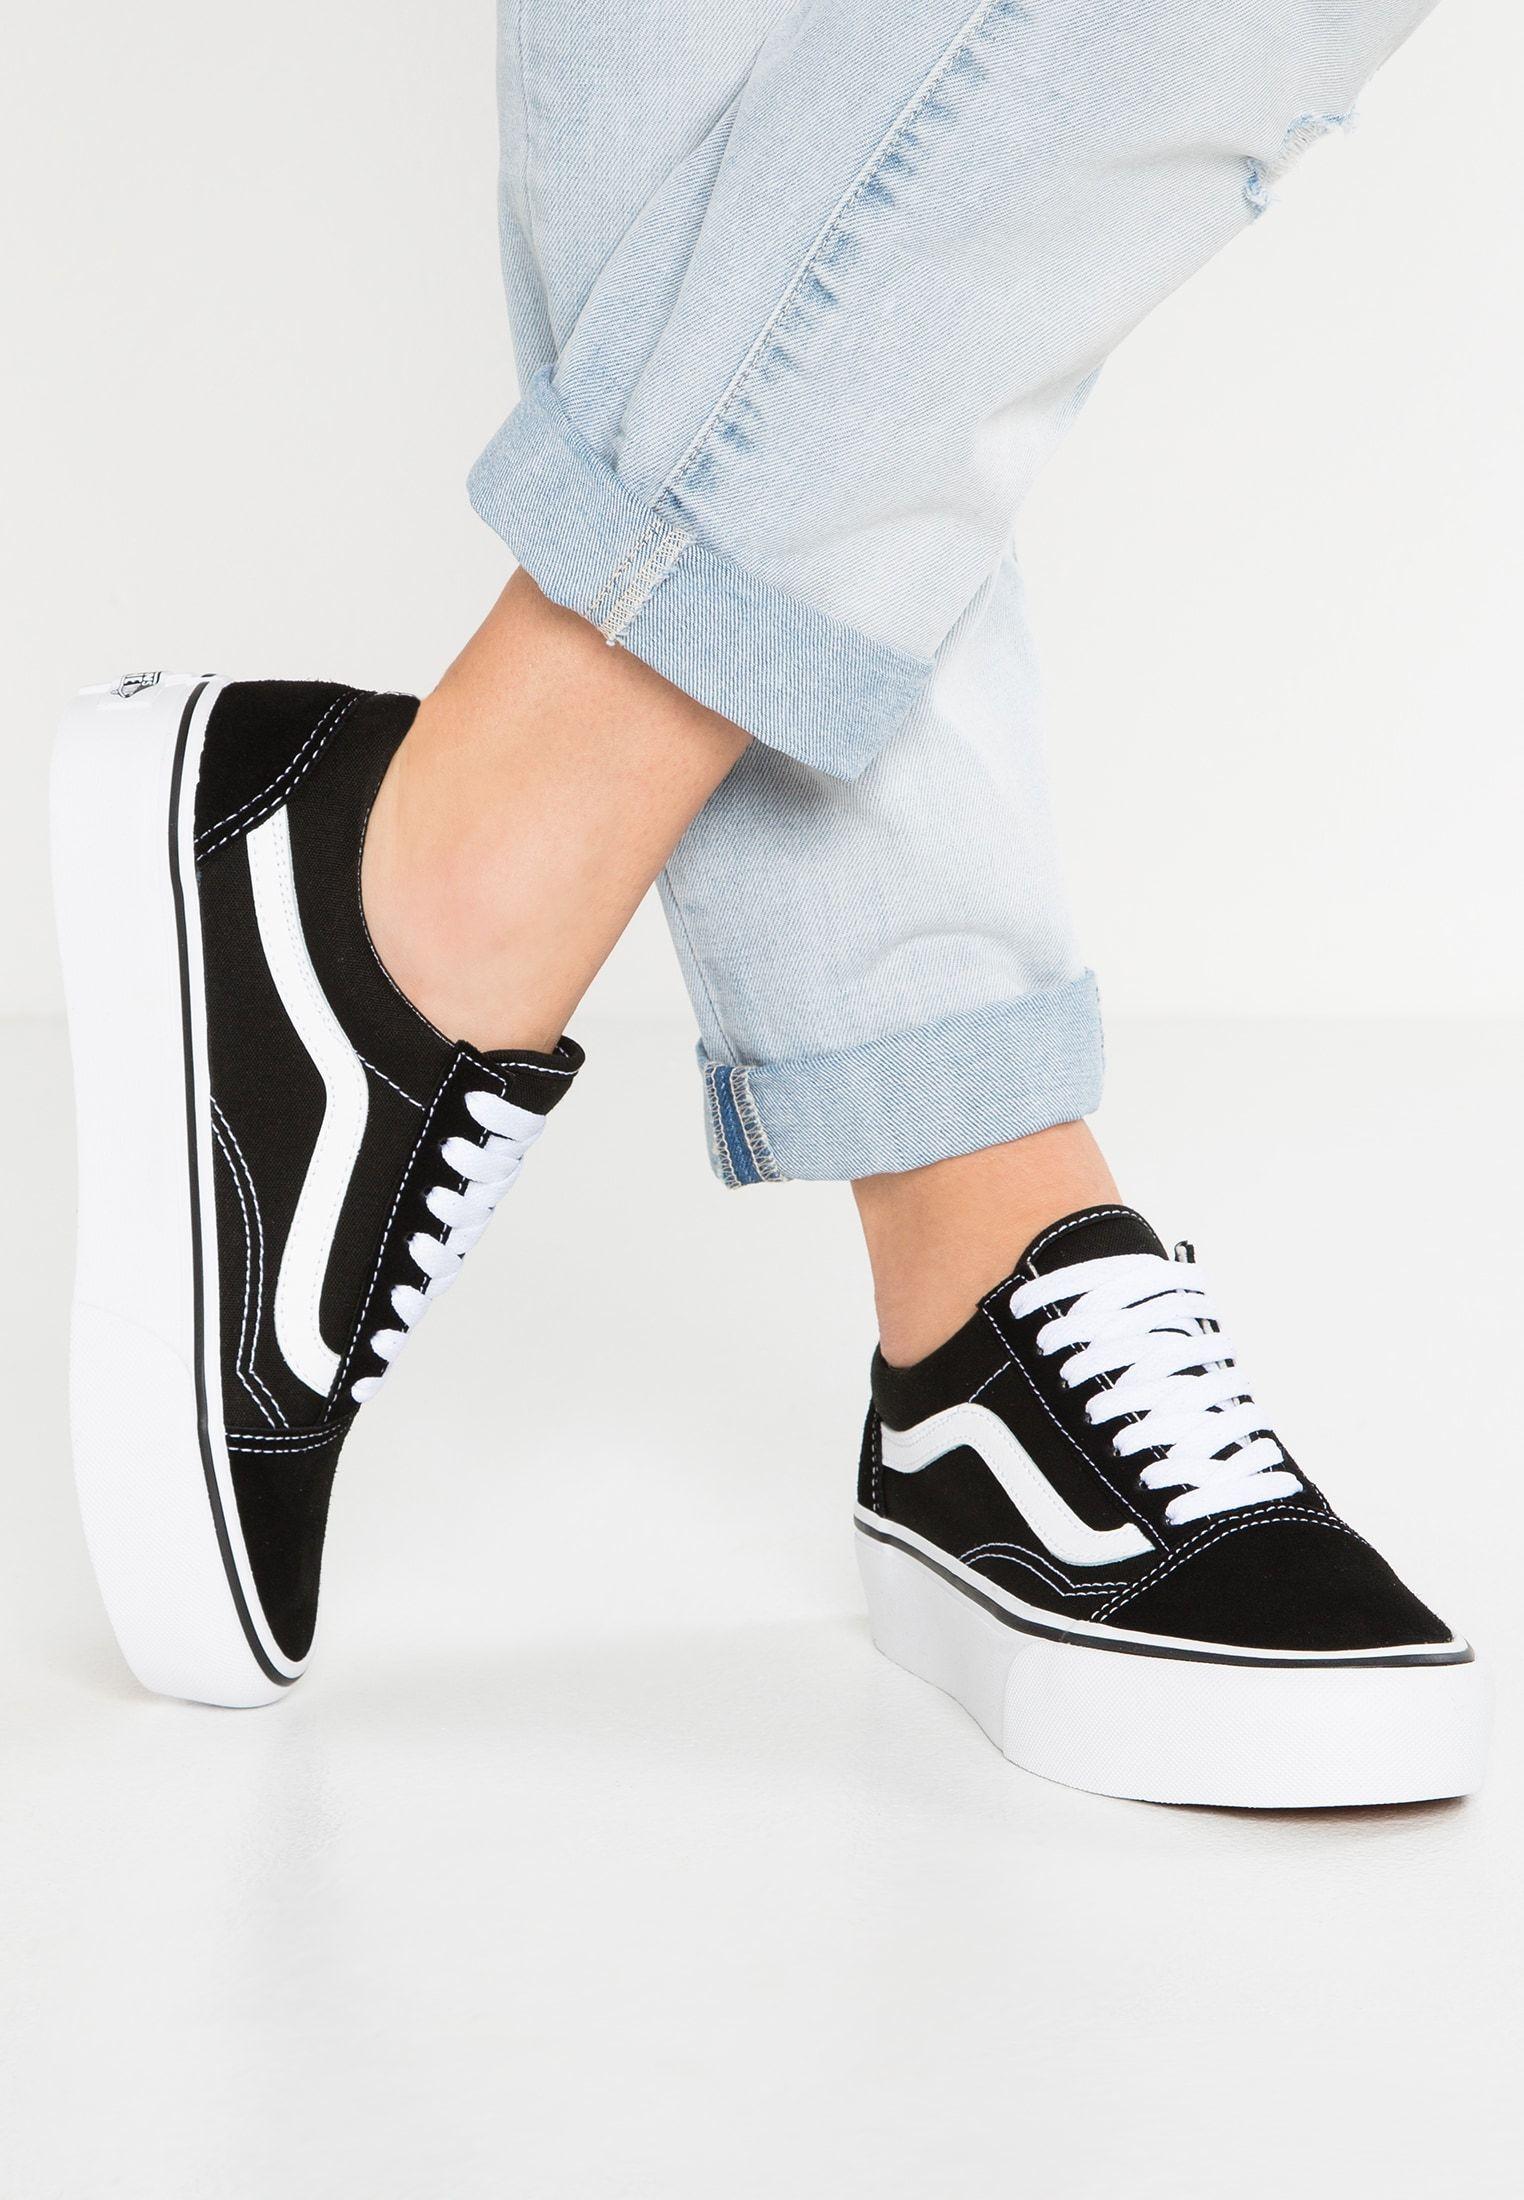 Chaussures et vêtements Vans en promos | Zalando